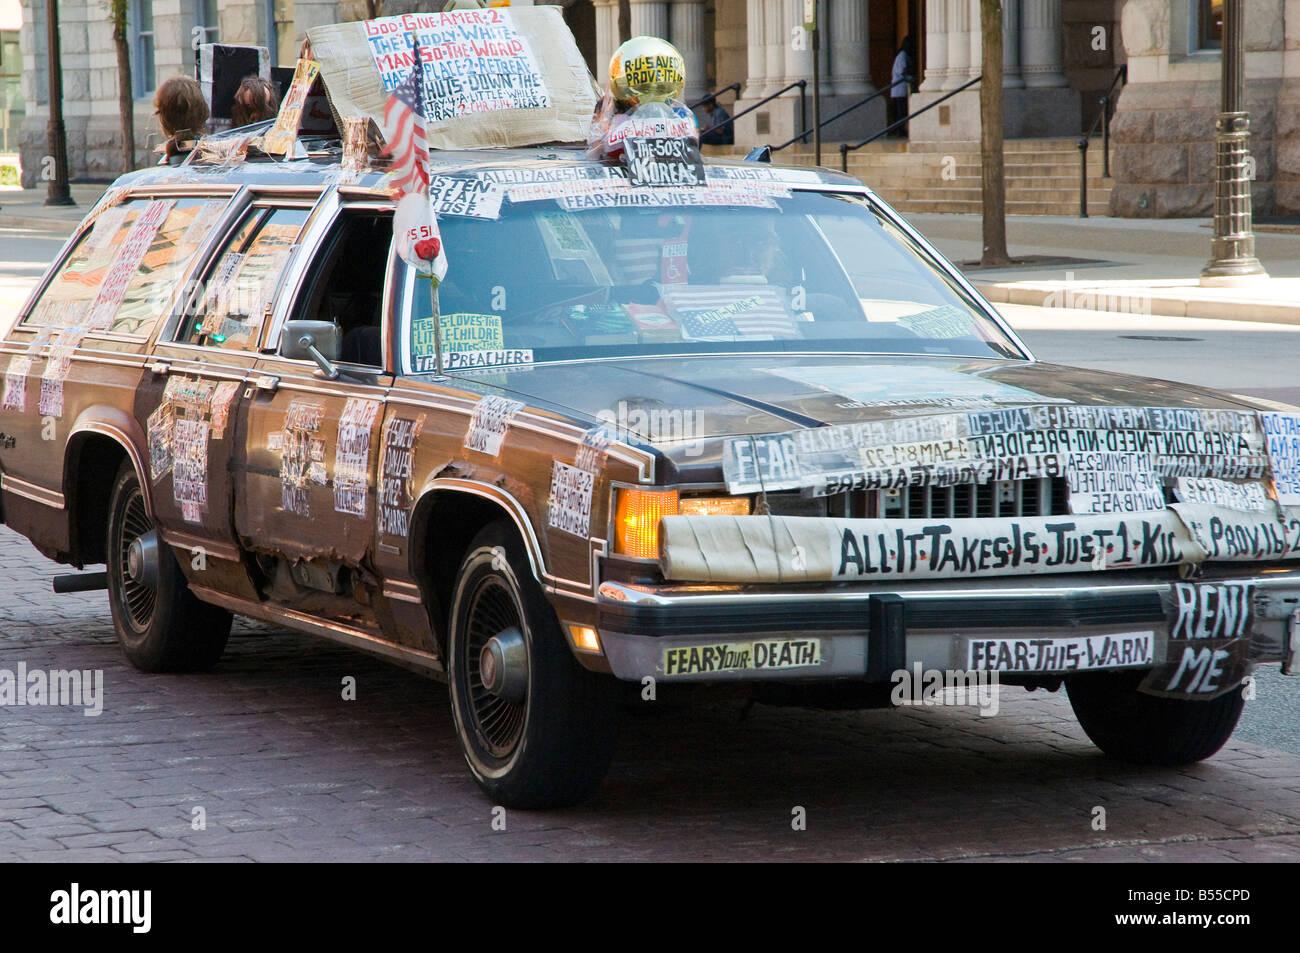 Preachers Car - Stock Image